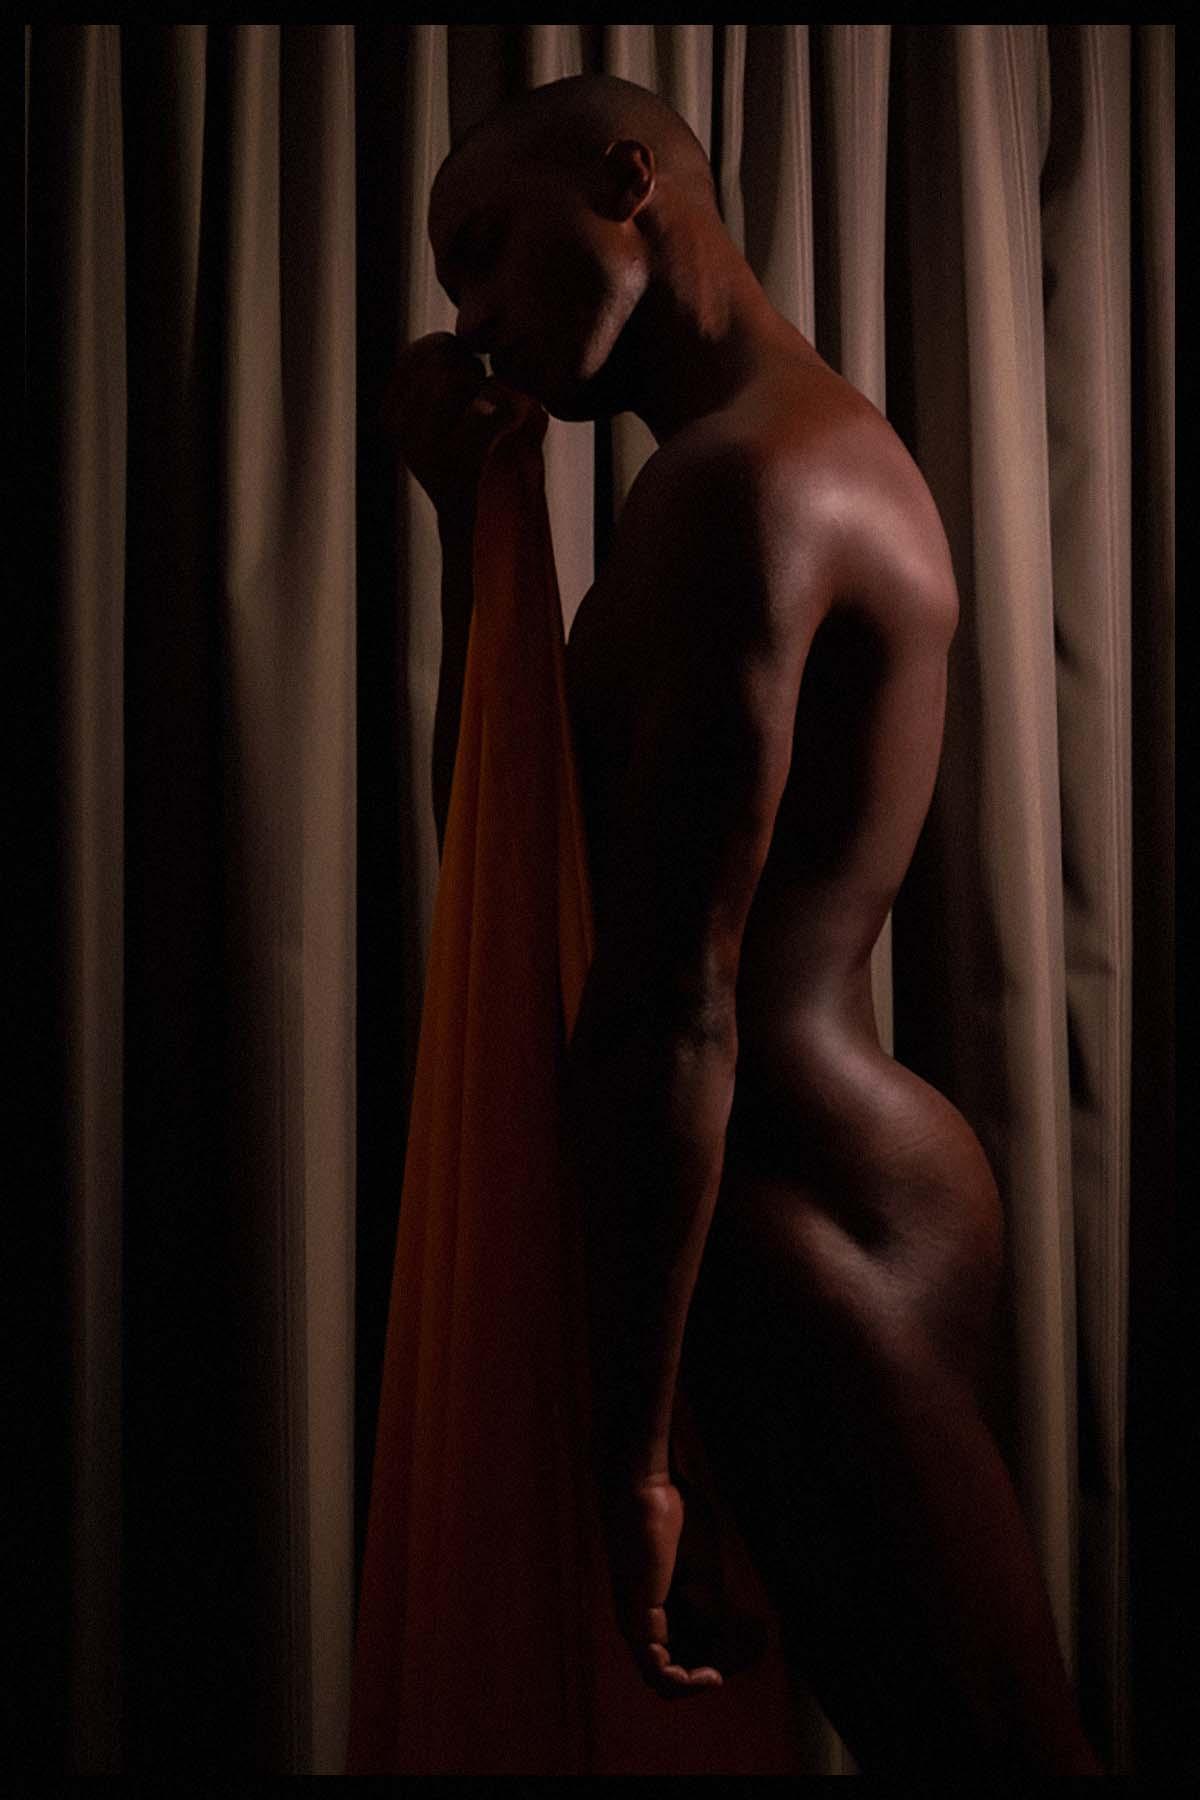 Joran Alcântara by Beto Urbano for Brazilian Male Model